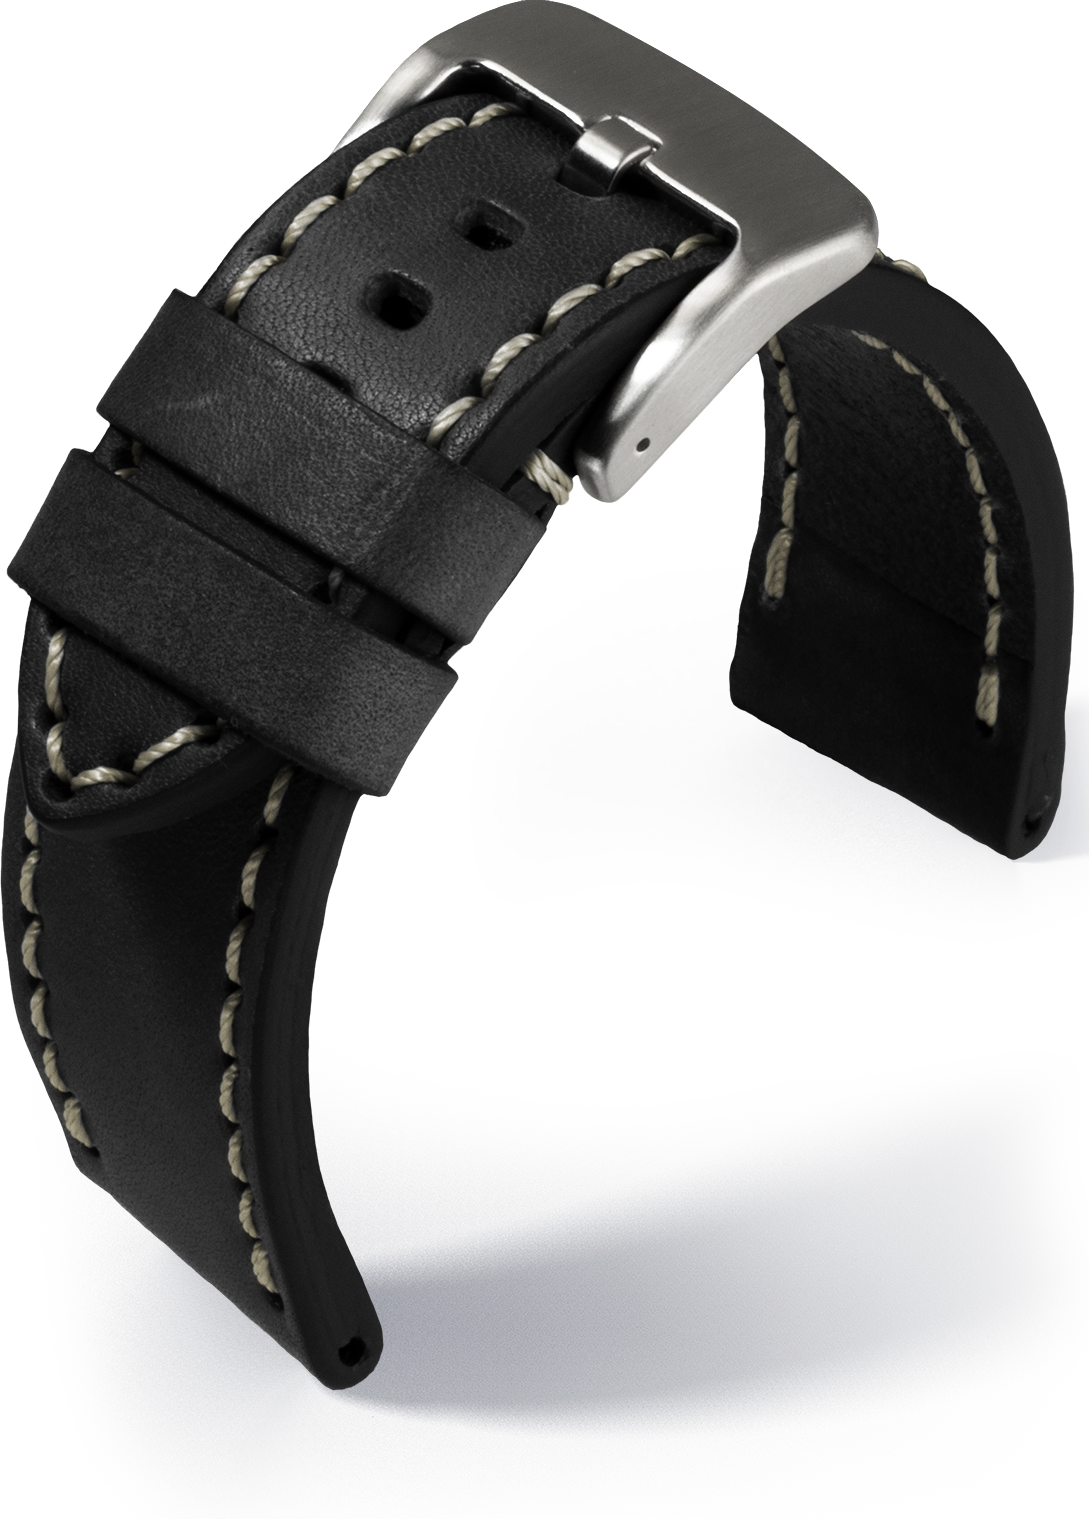 wristwatch bands - HD1089×1519